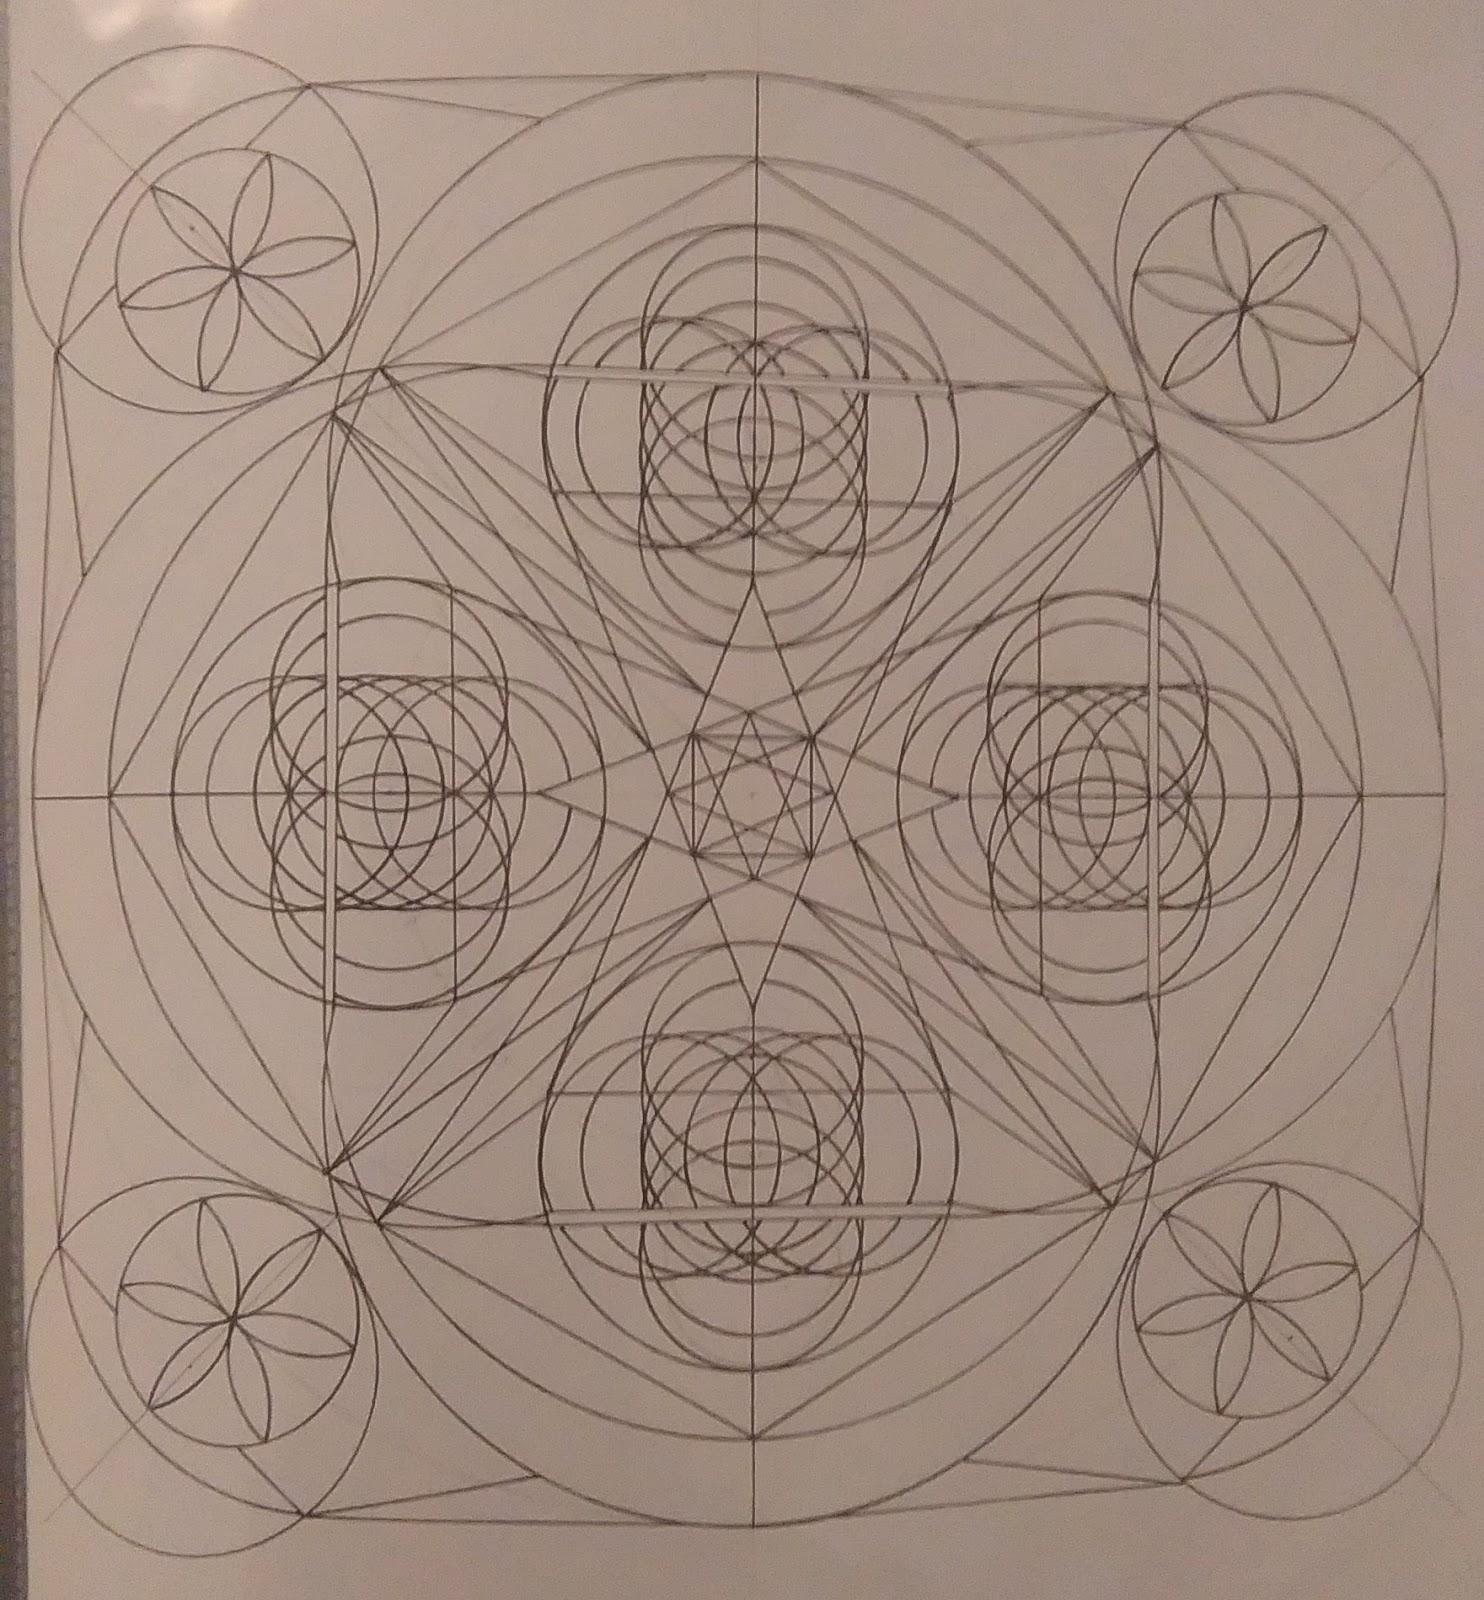 [SPOLYK] - Geometries & sketches - Page 6 47575472_1103195556533794_5827981144171216896_o